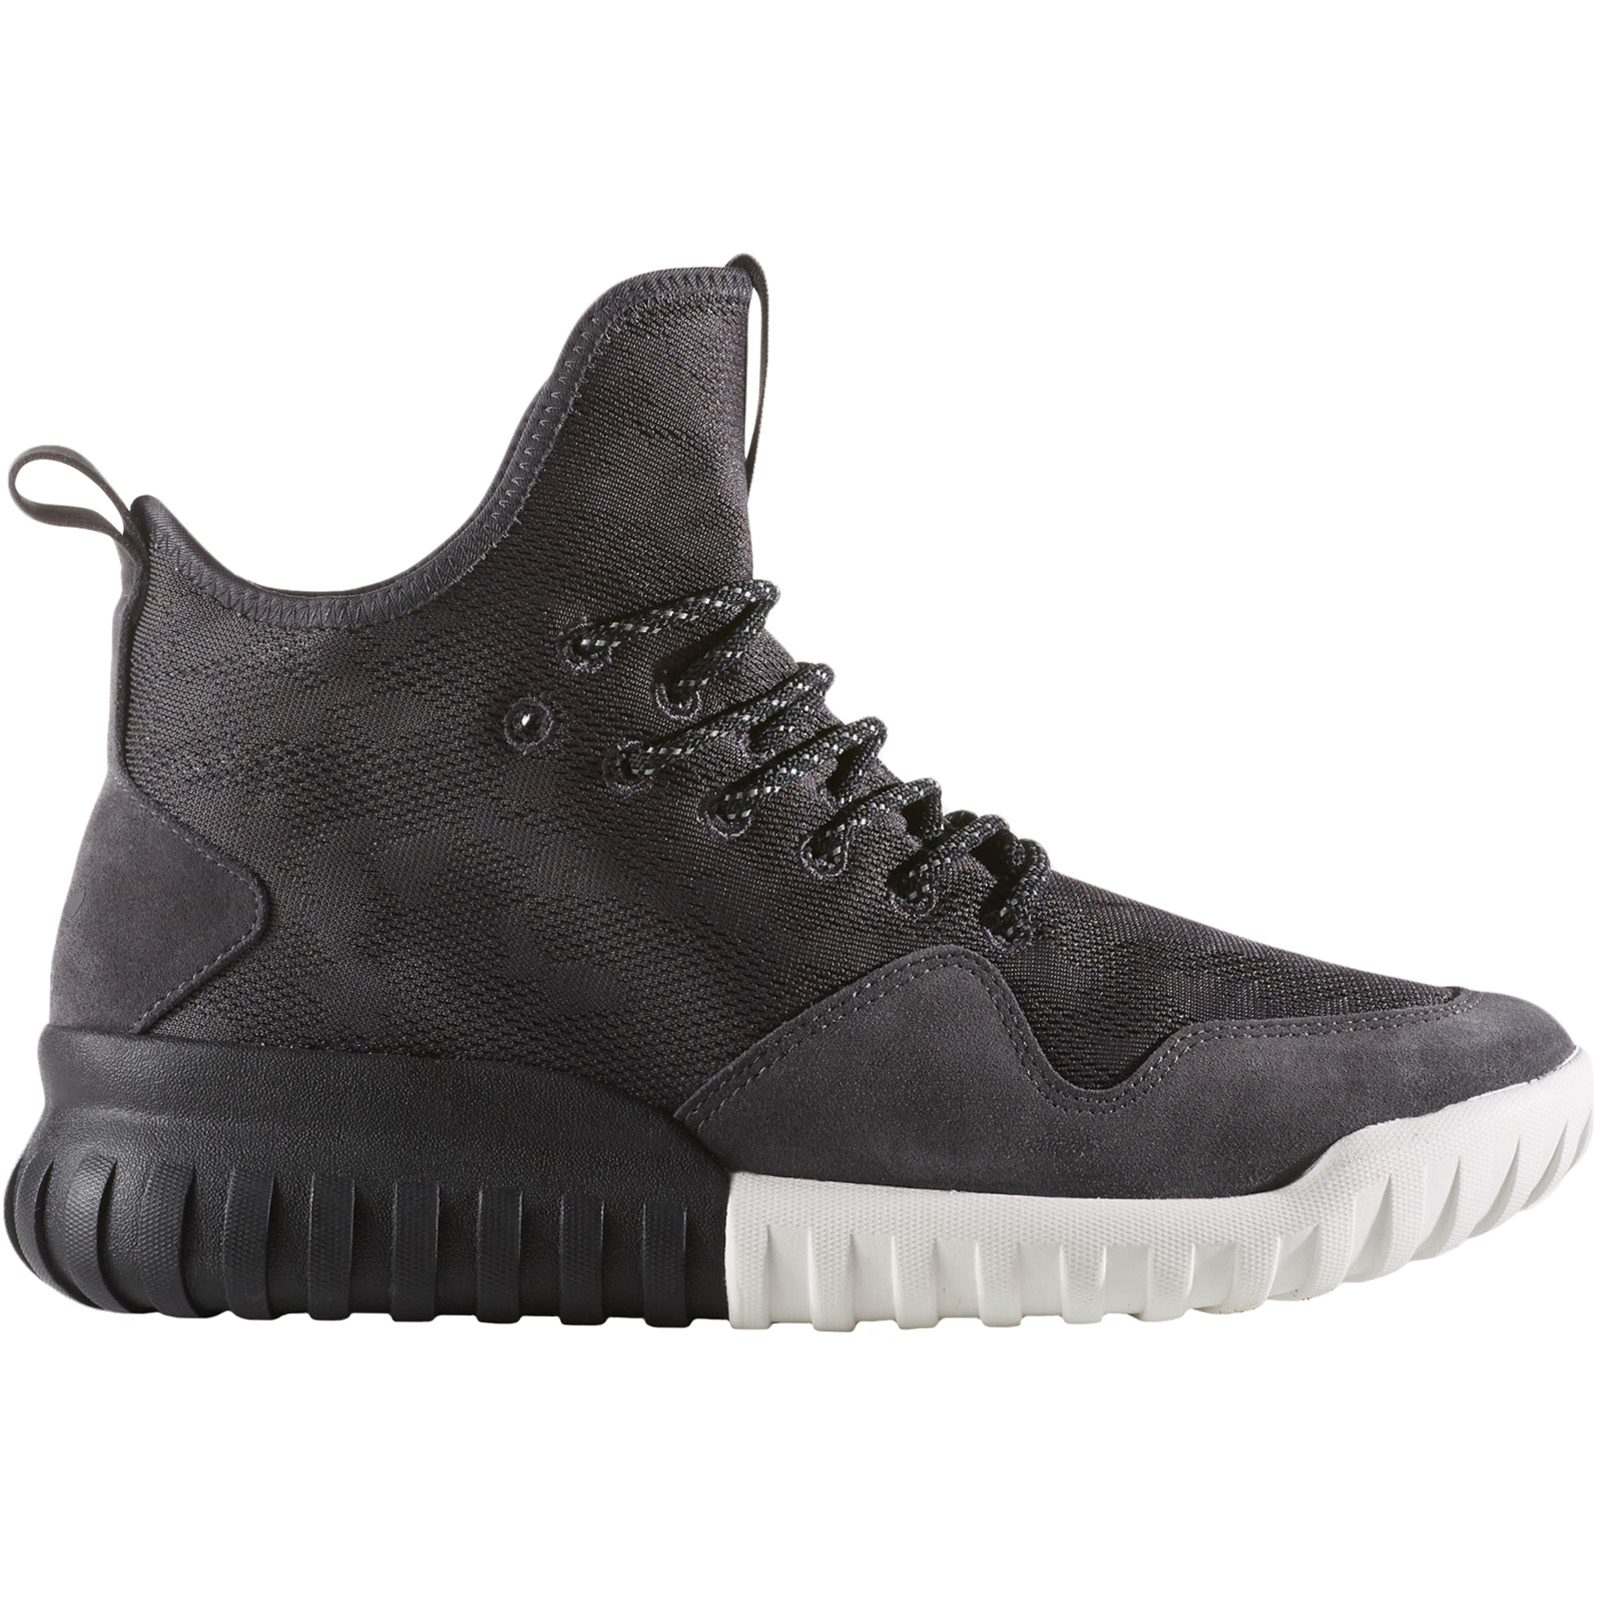 competitive price 8624e 256ec Details about adidas Originals Mens Tubular X UNCGD Casual Hi Top Lace Up  Trainers Shoes-Black